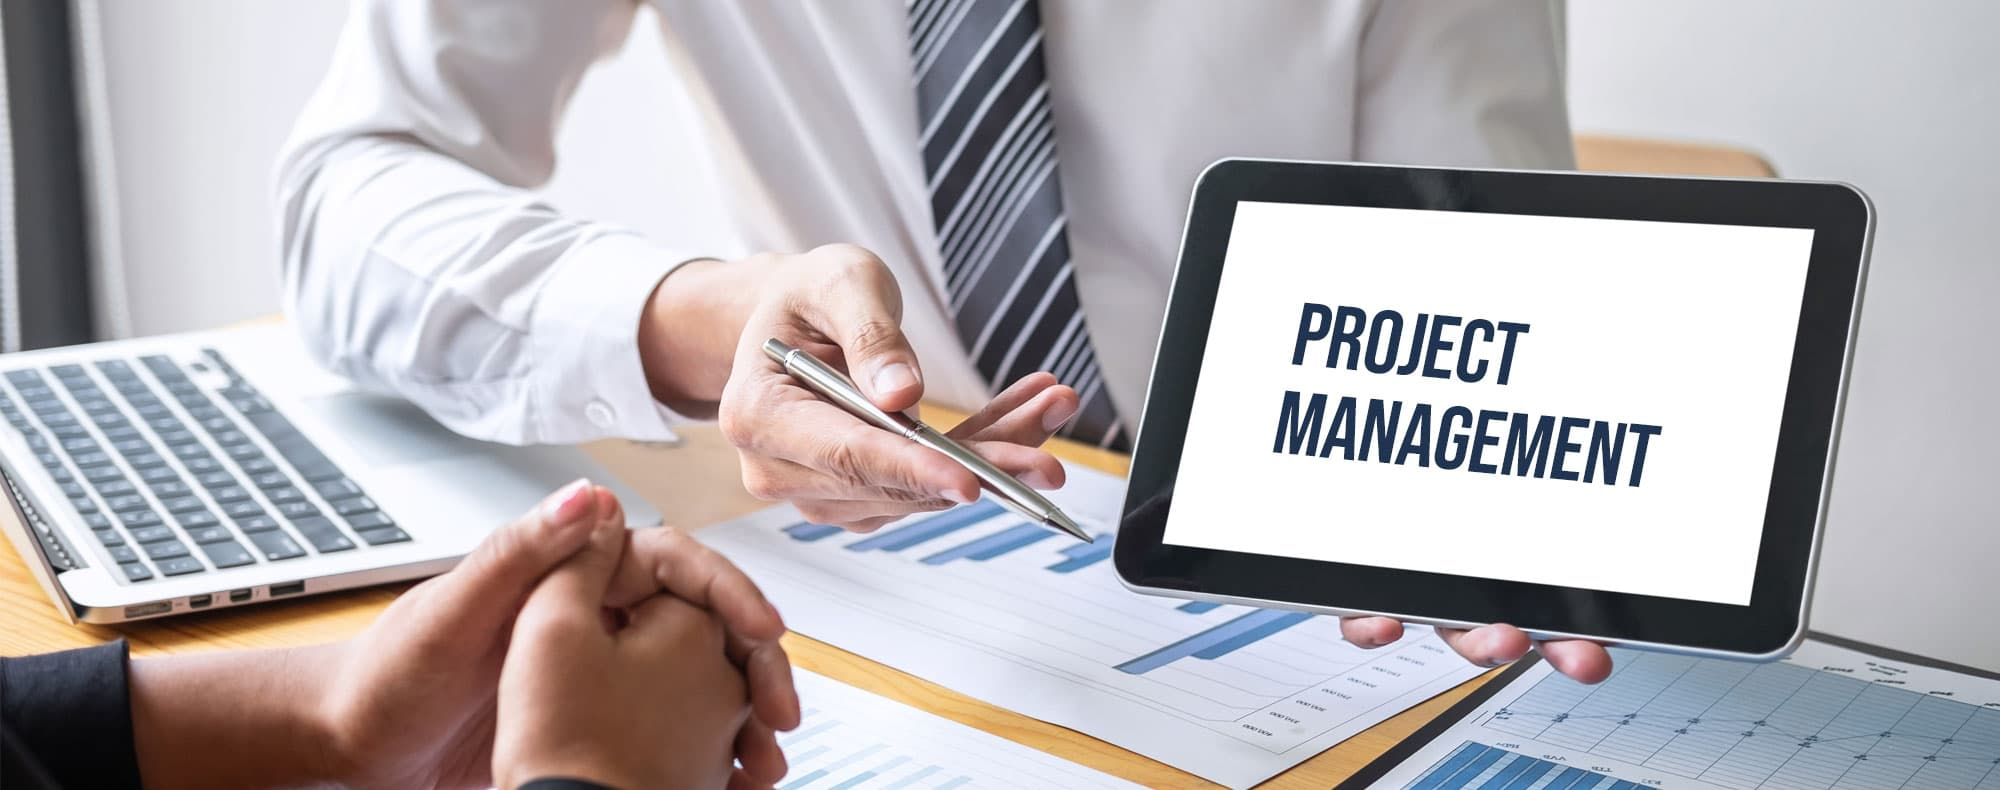 Project Management IMG - WUC